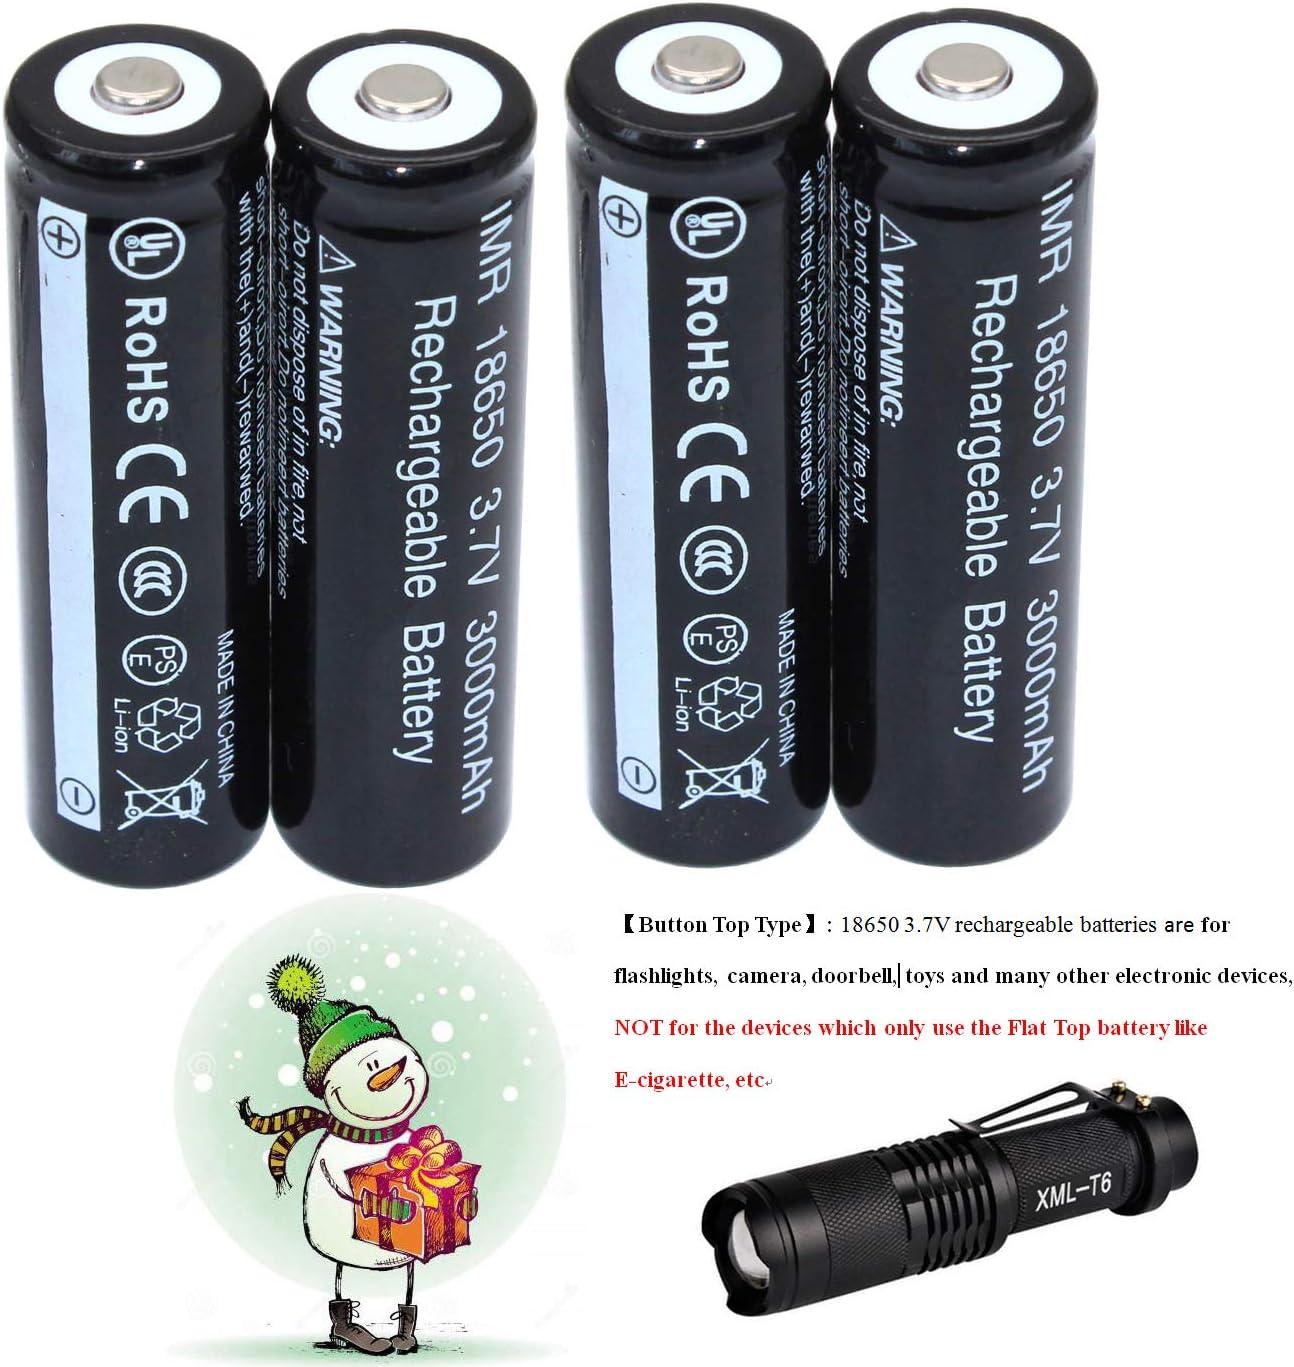 Pilas recargables 18650 de 3,7 V de Iones de litio, paquete de 4 + linterna LED de regalo